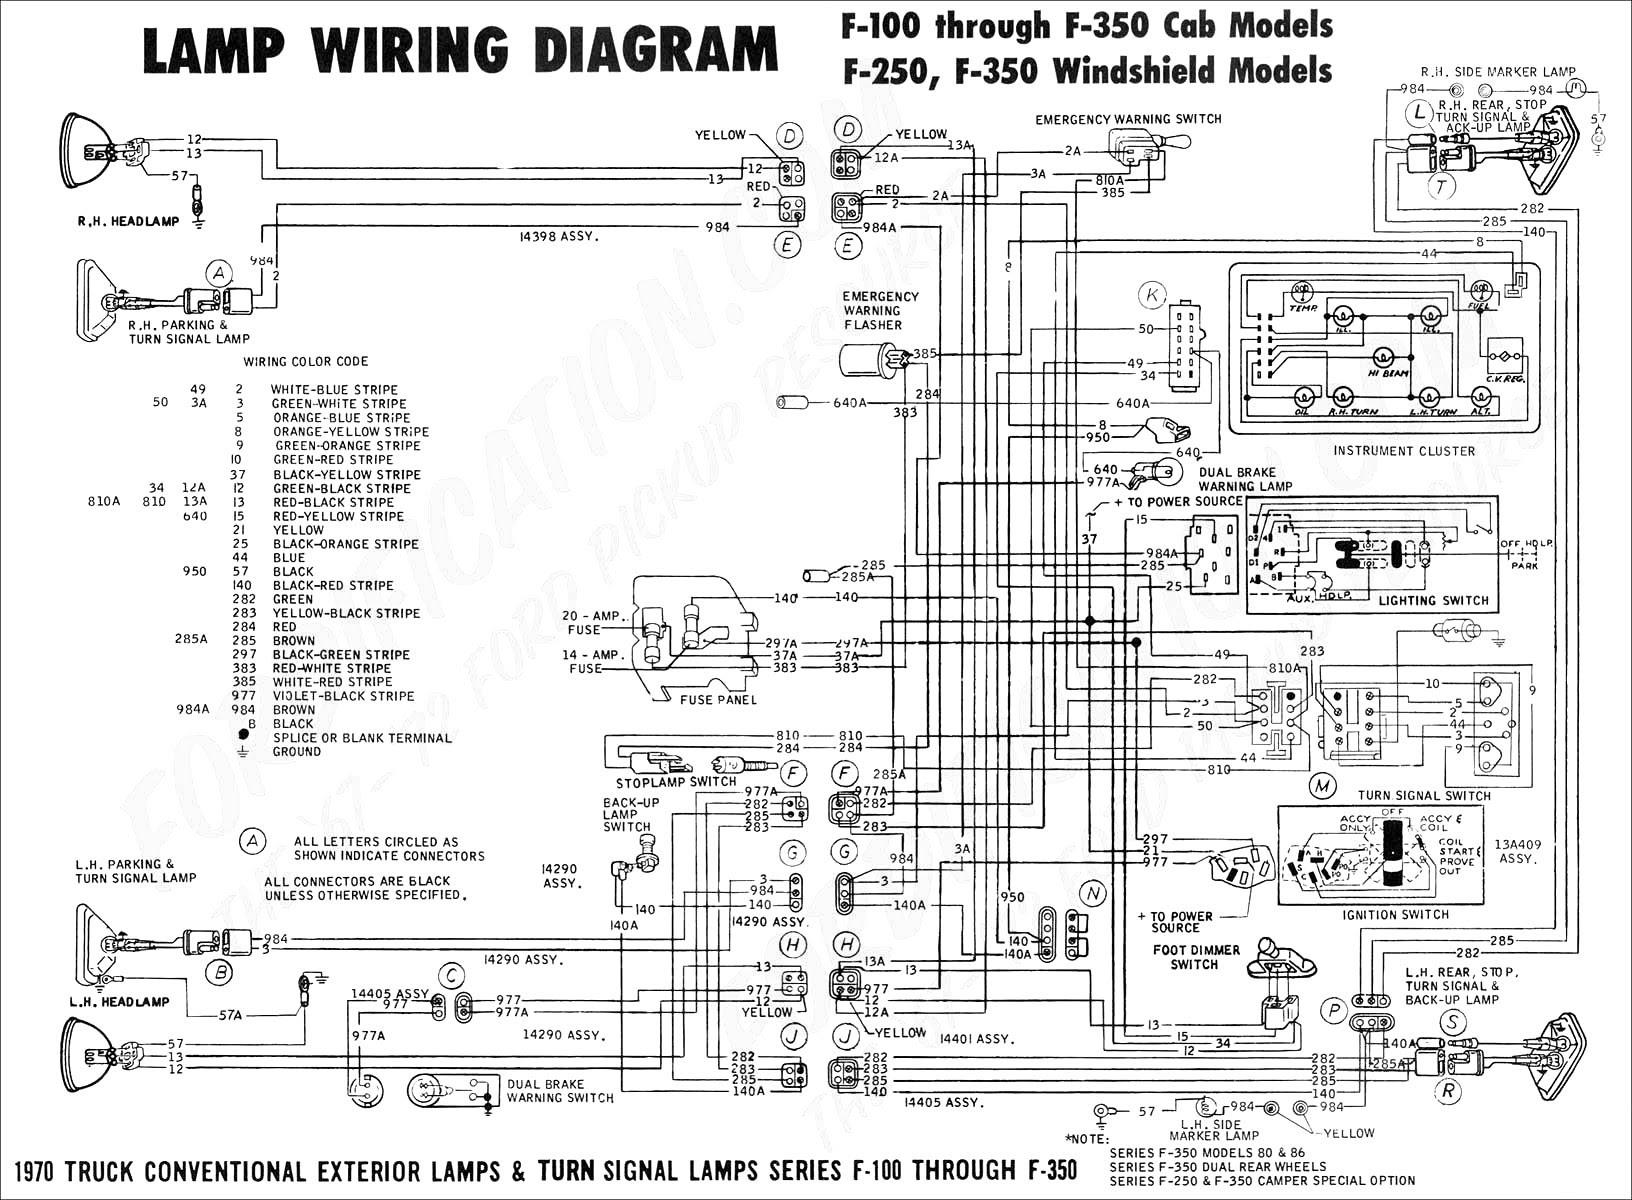 145 1999 Escalade Fuel Pump Wiring Diagram Wiring Library